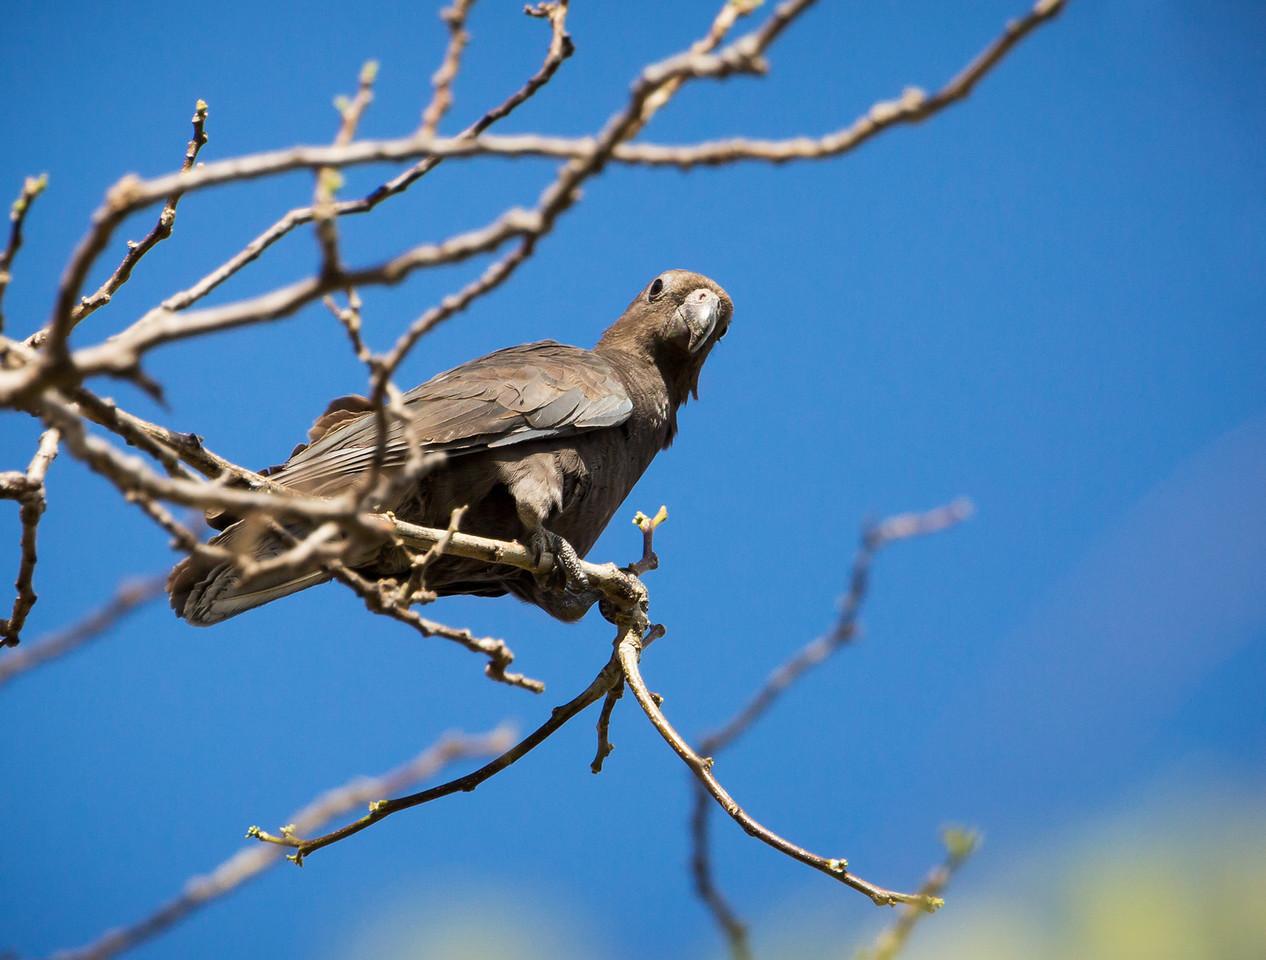 Greater Vasa Parrot (Coracopsis vasa).